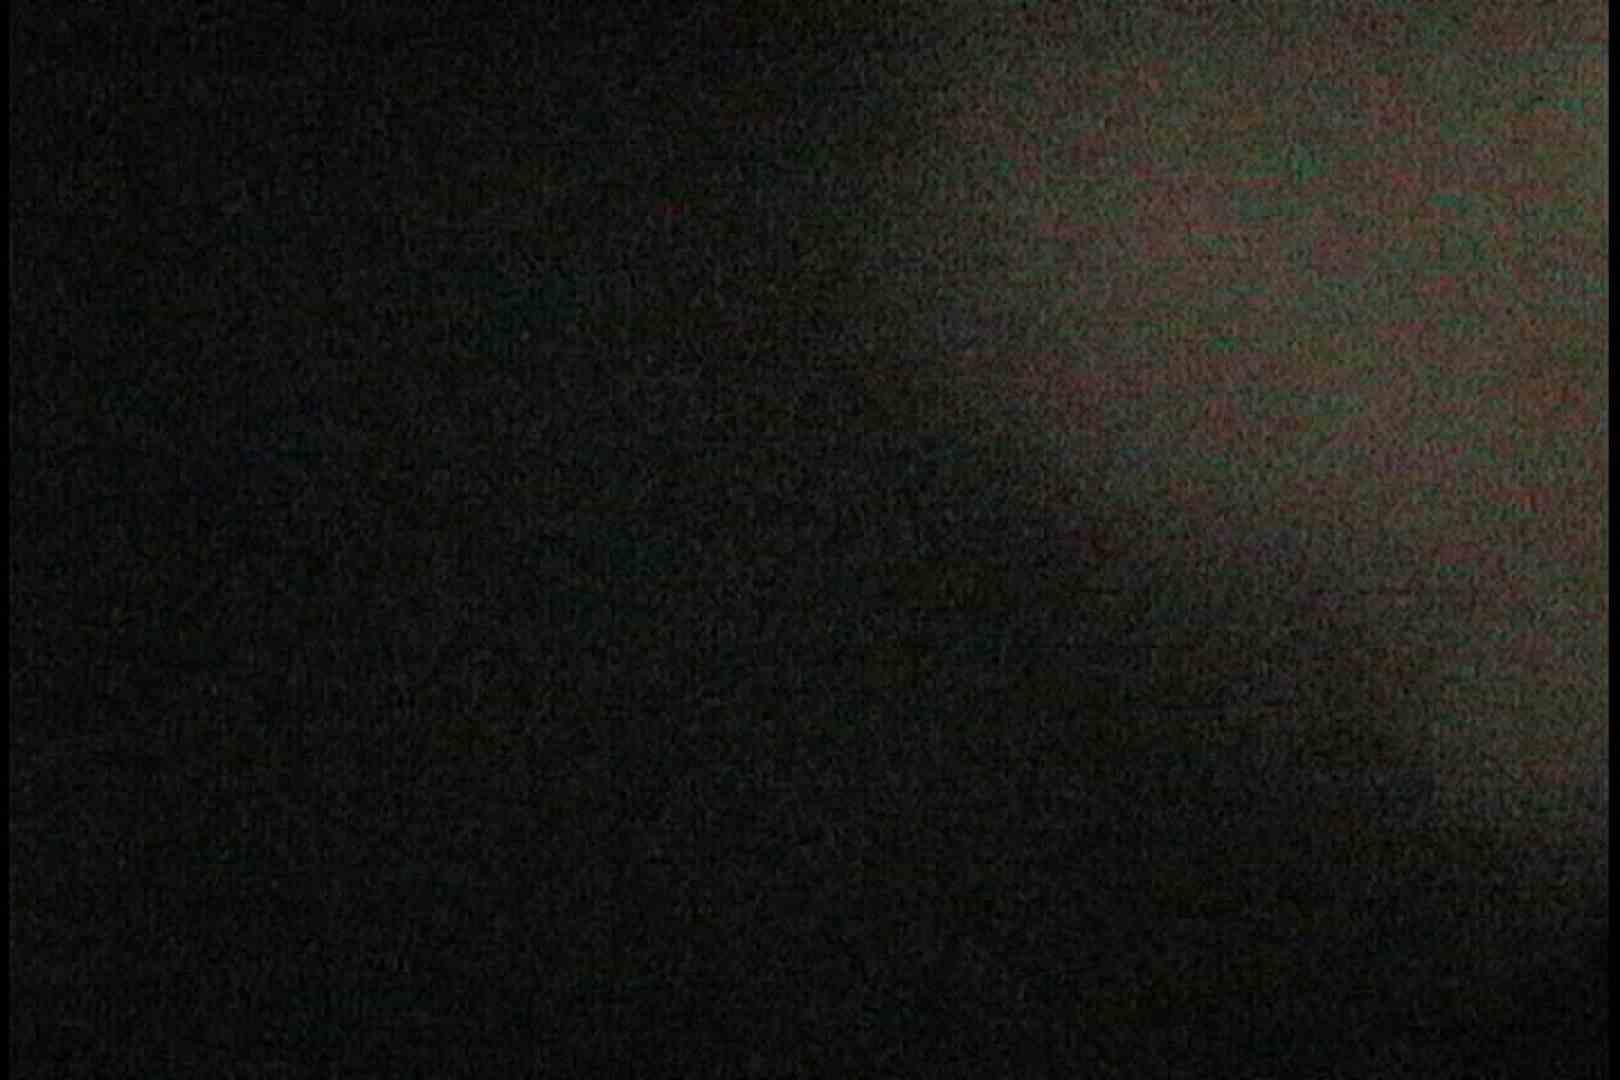 No.68 見事に可愛い巨乳ちゃん 室内暗いです 乙女もsex ワレメ動画紹介 79枚 62